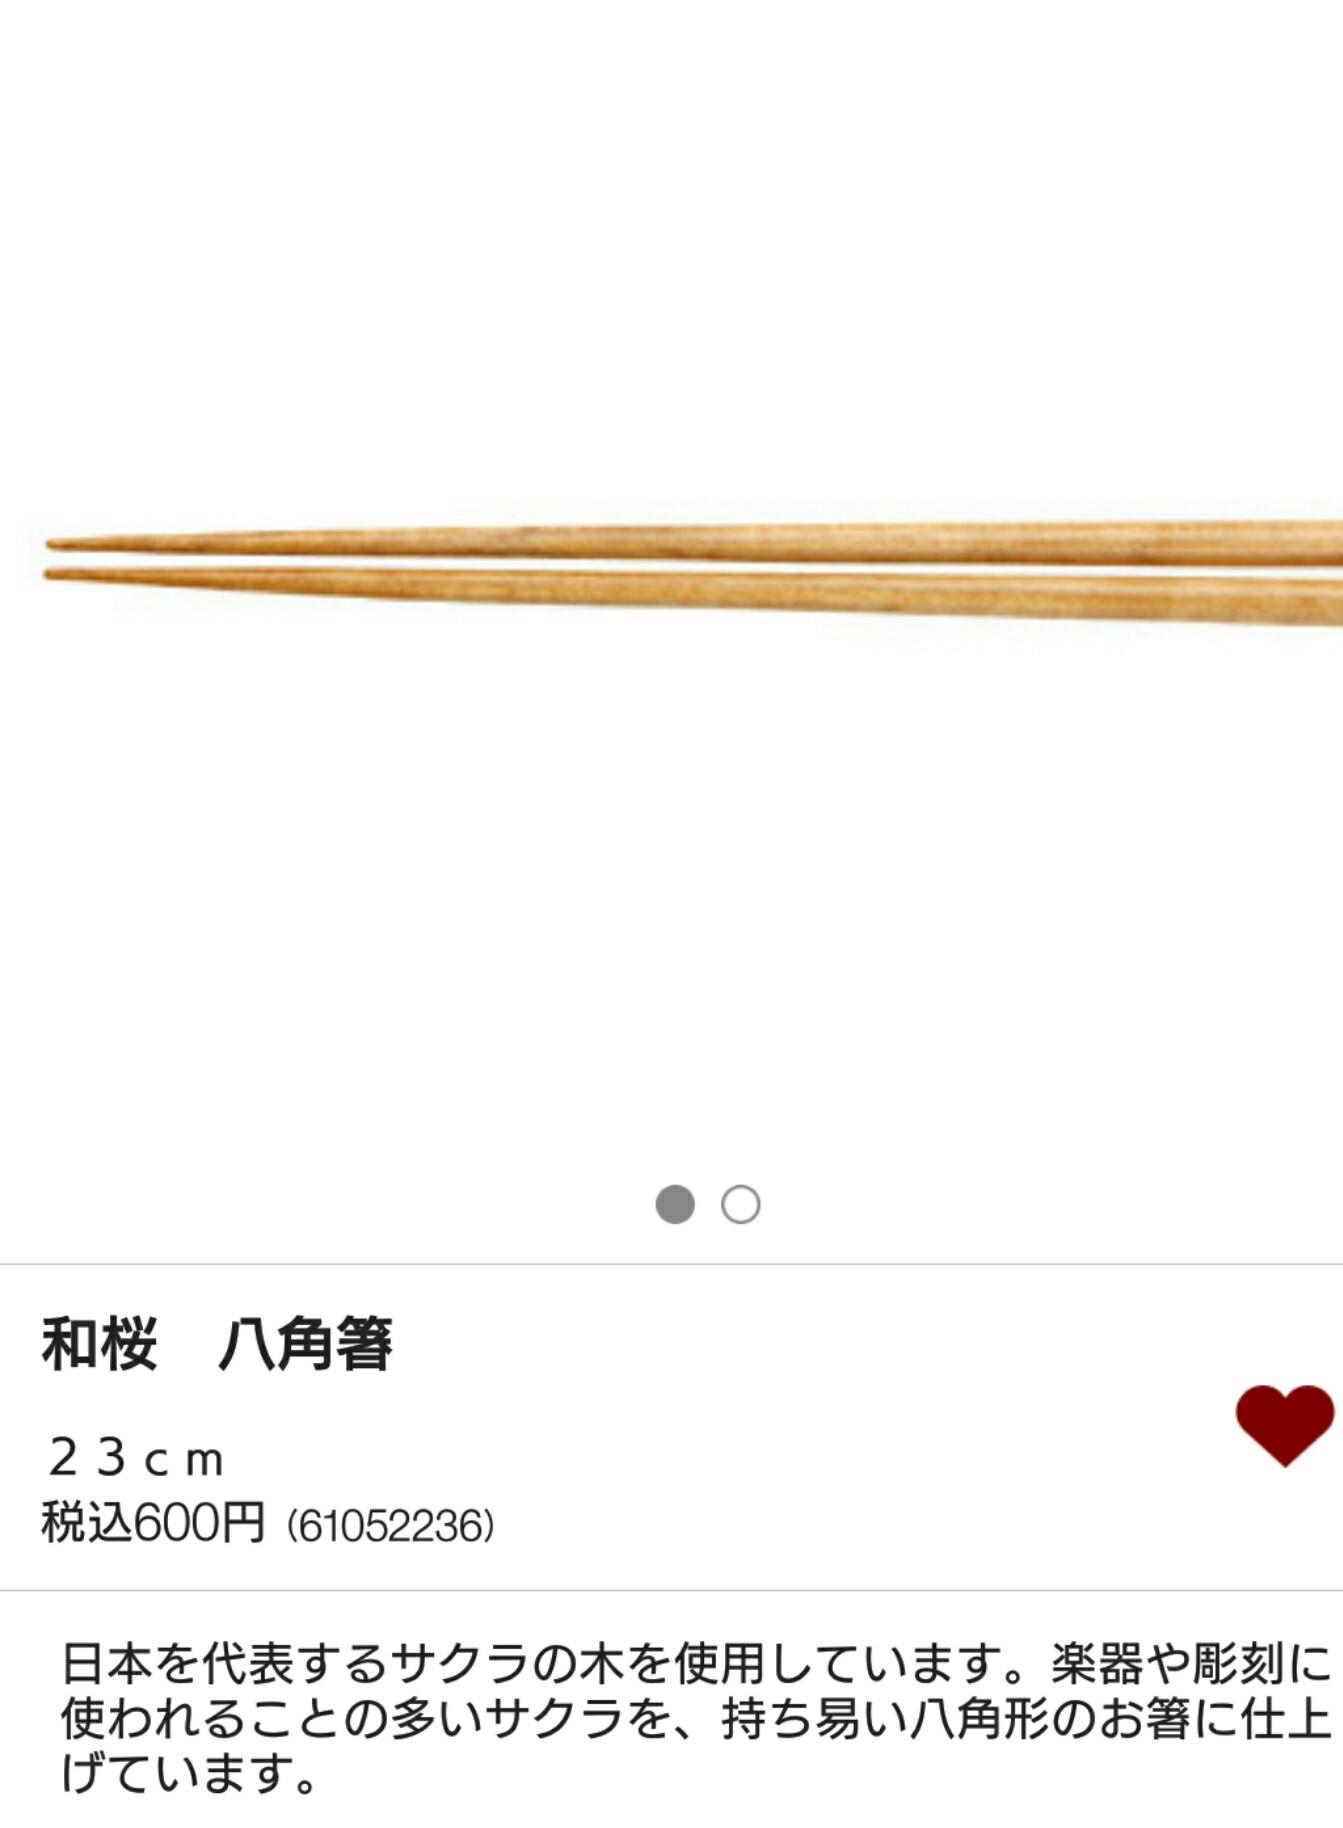 f:id:akisan01:20160130185822j:image